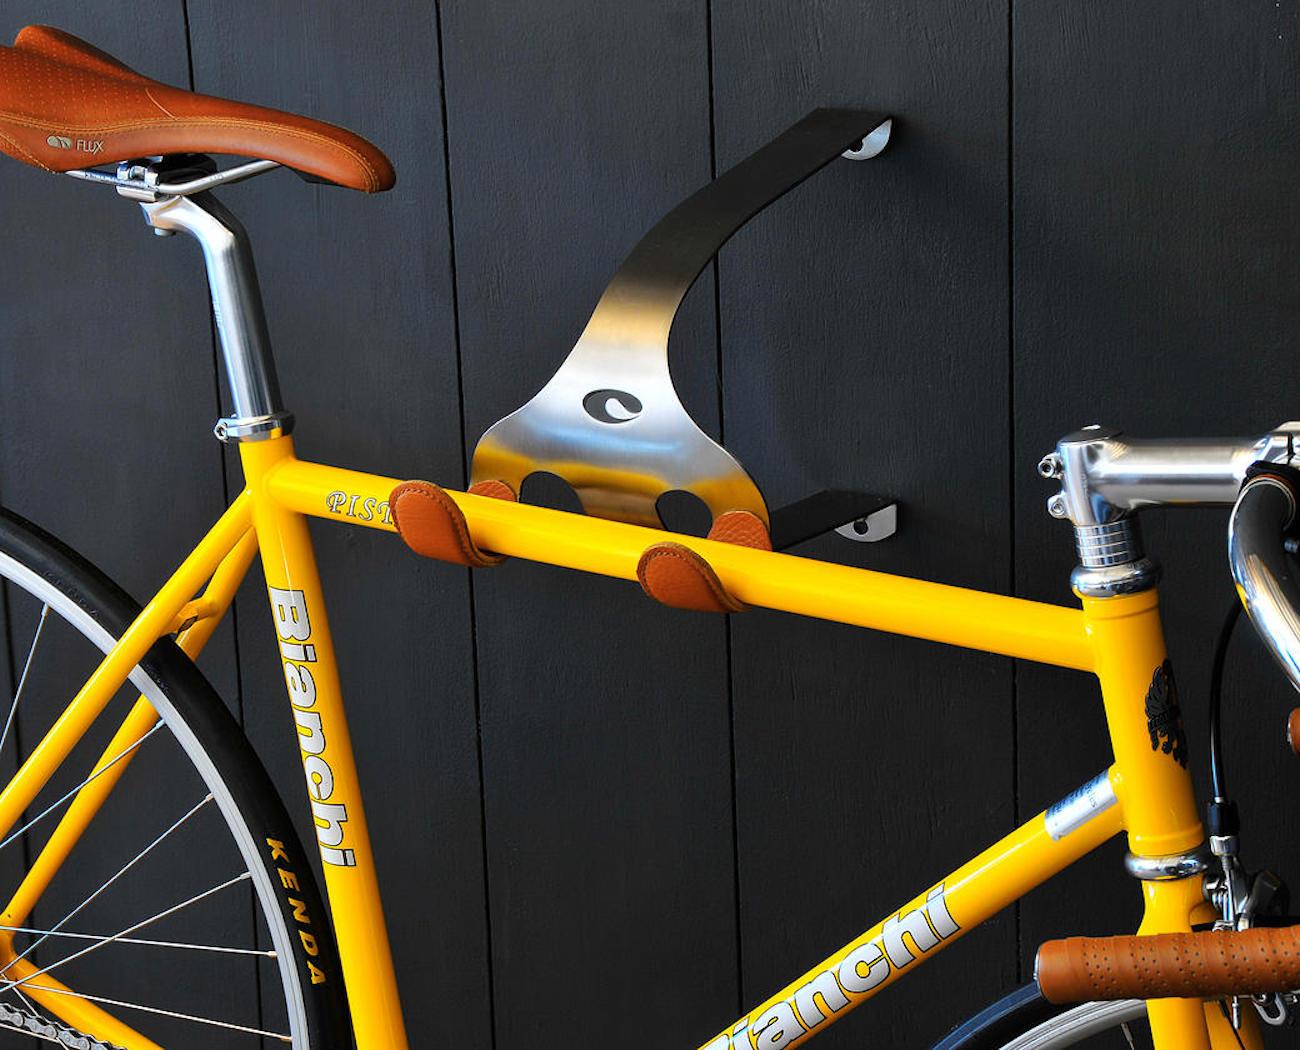 cactus-tongue-ssl-wall-mounted-bike-hanger-01